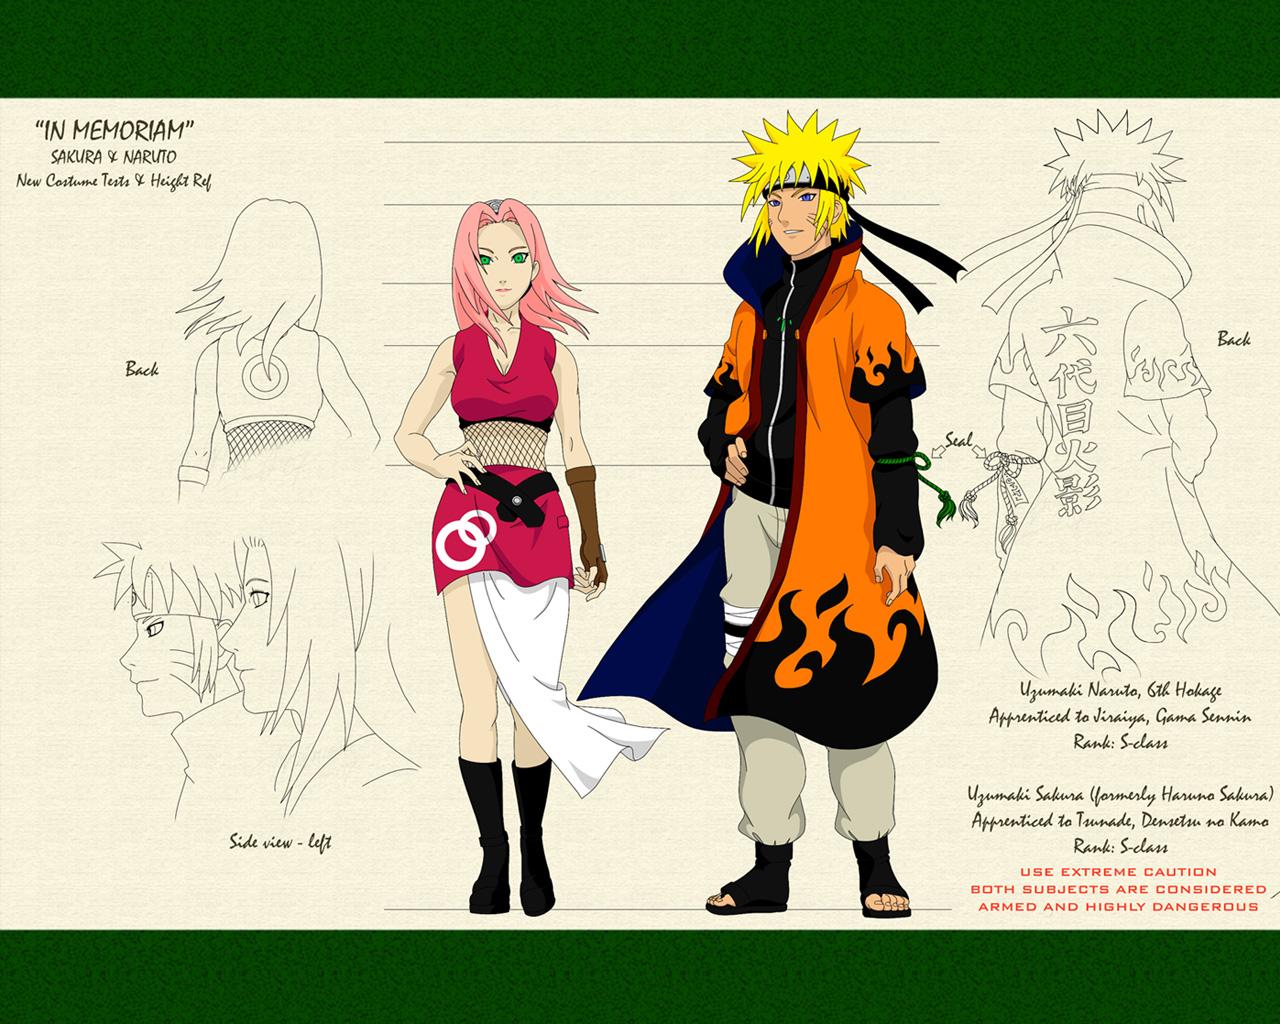 Th Hokage Large 1280x1024 Anime Wallpapers Anime Wallpapers